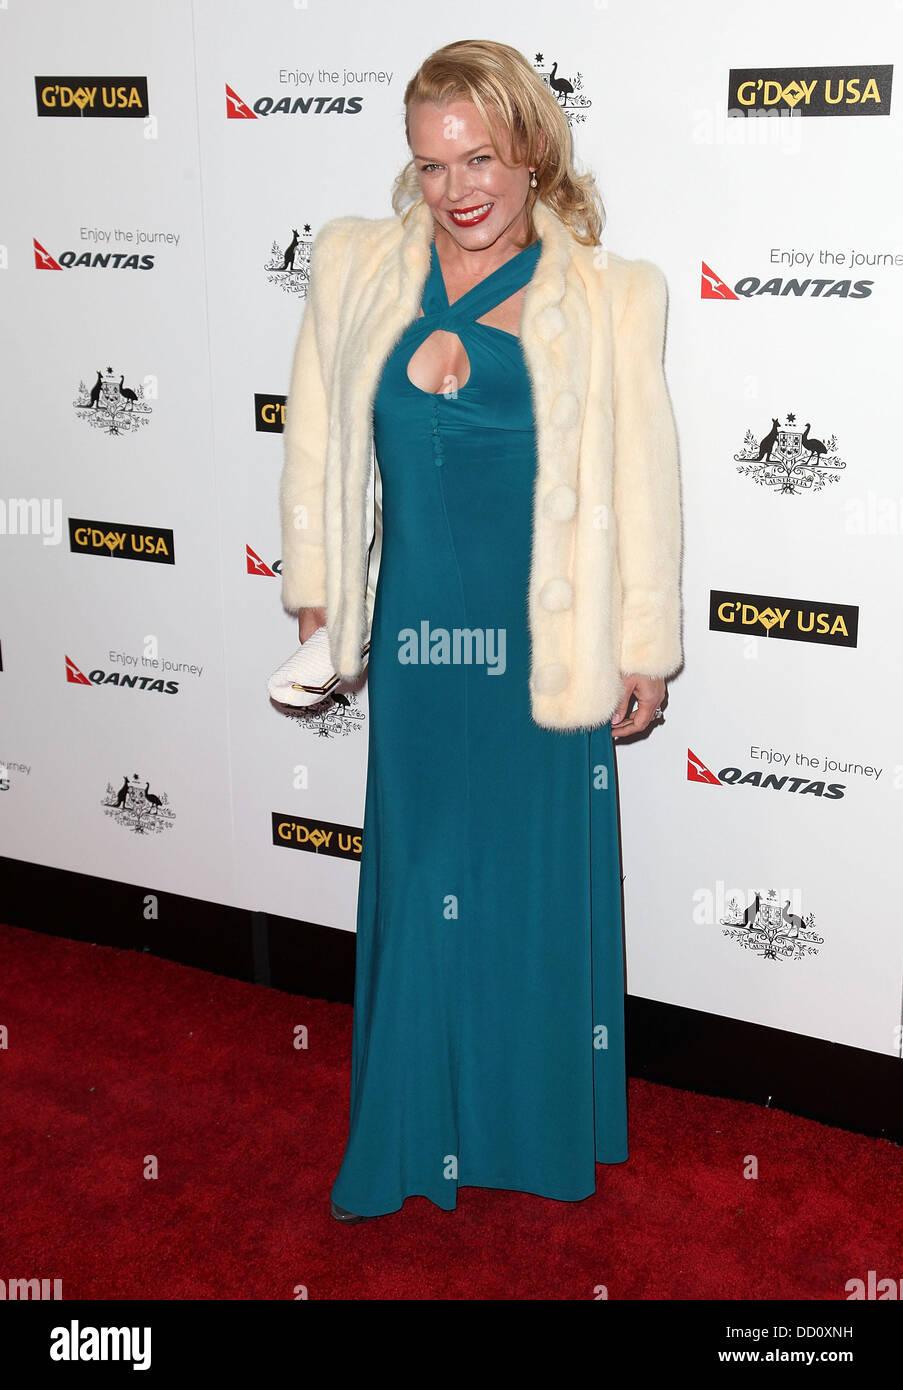 Sam Healy,Una Merkel Hot pics & movies Christine Mayo,Shirley Strickland 7 Olympic medals